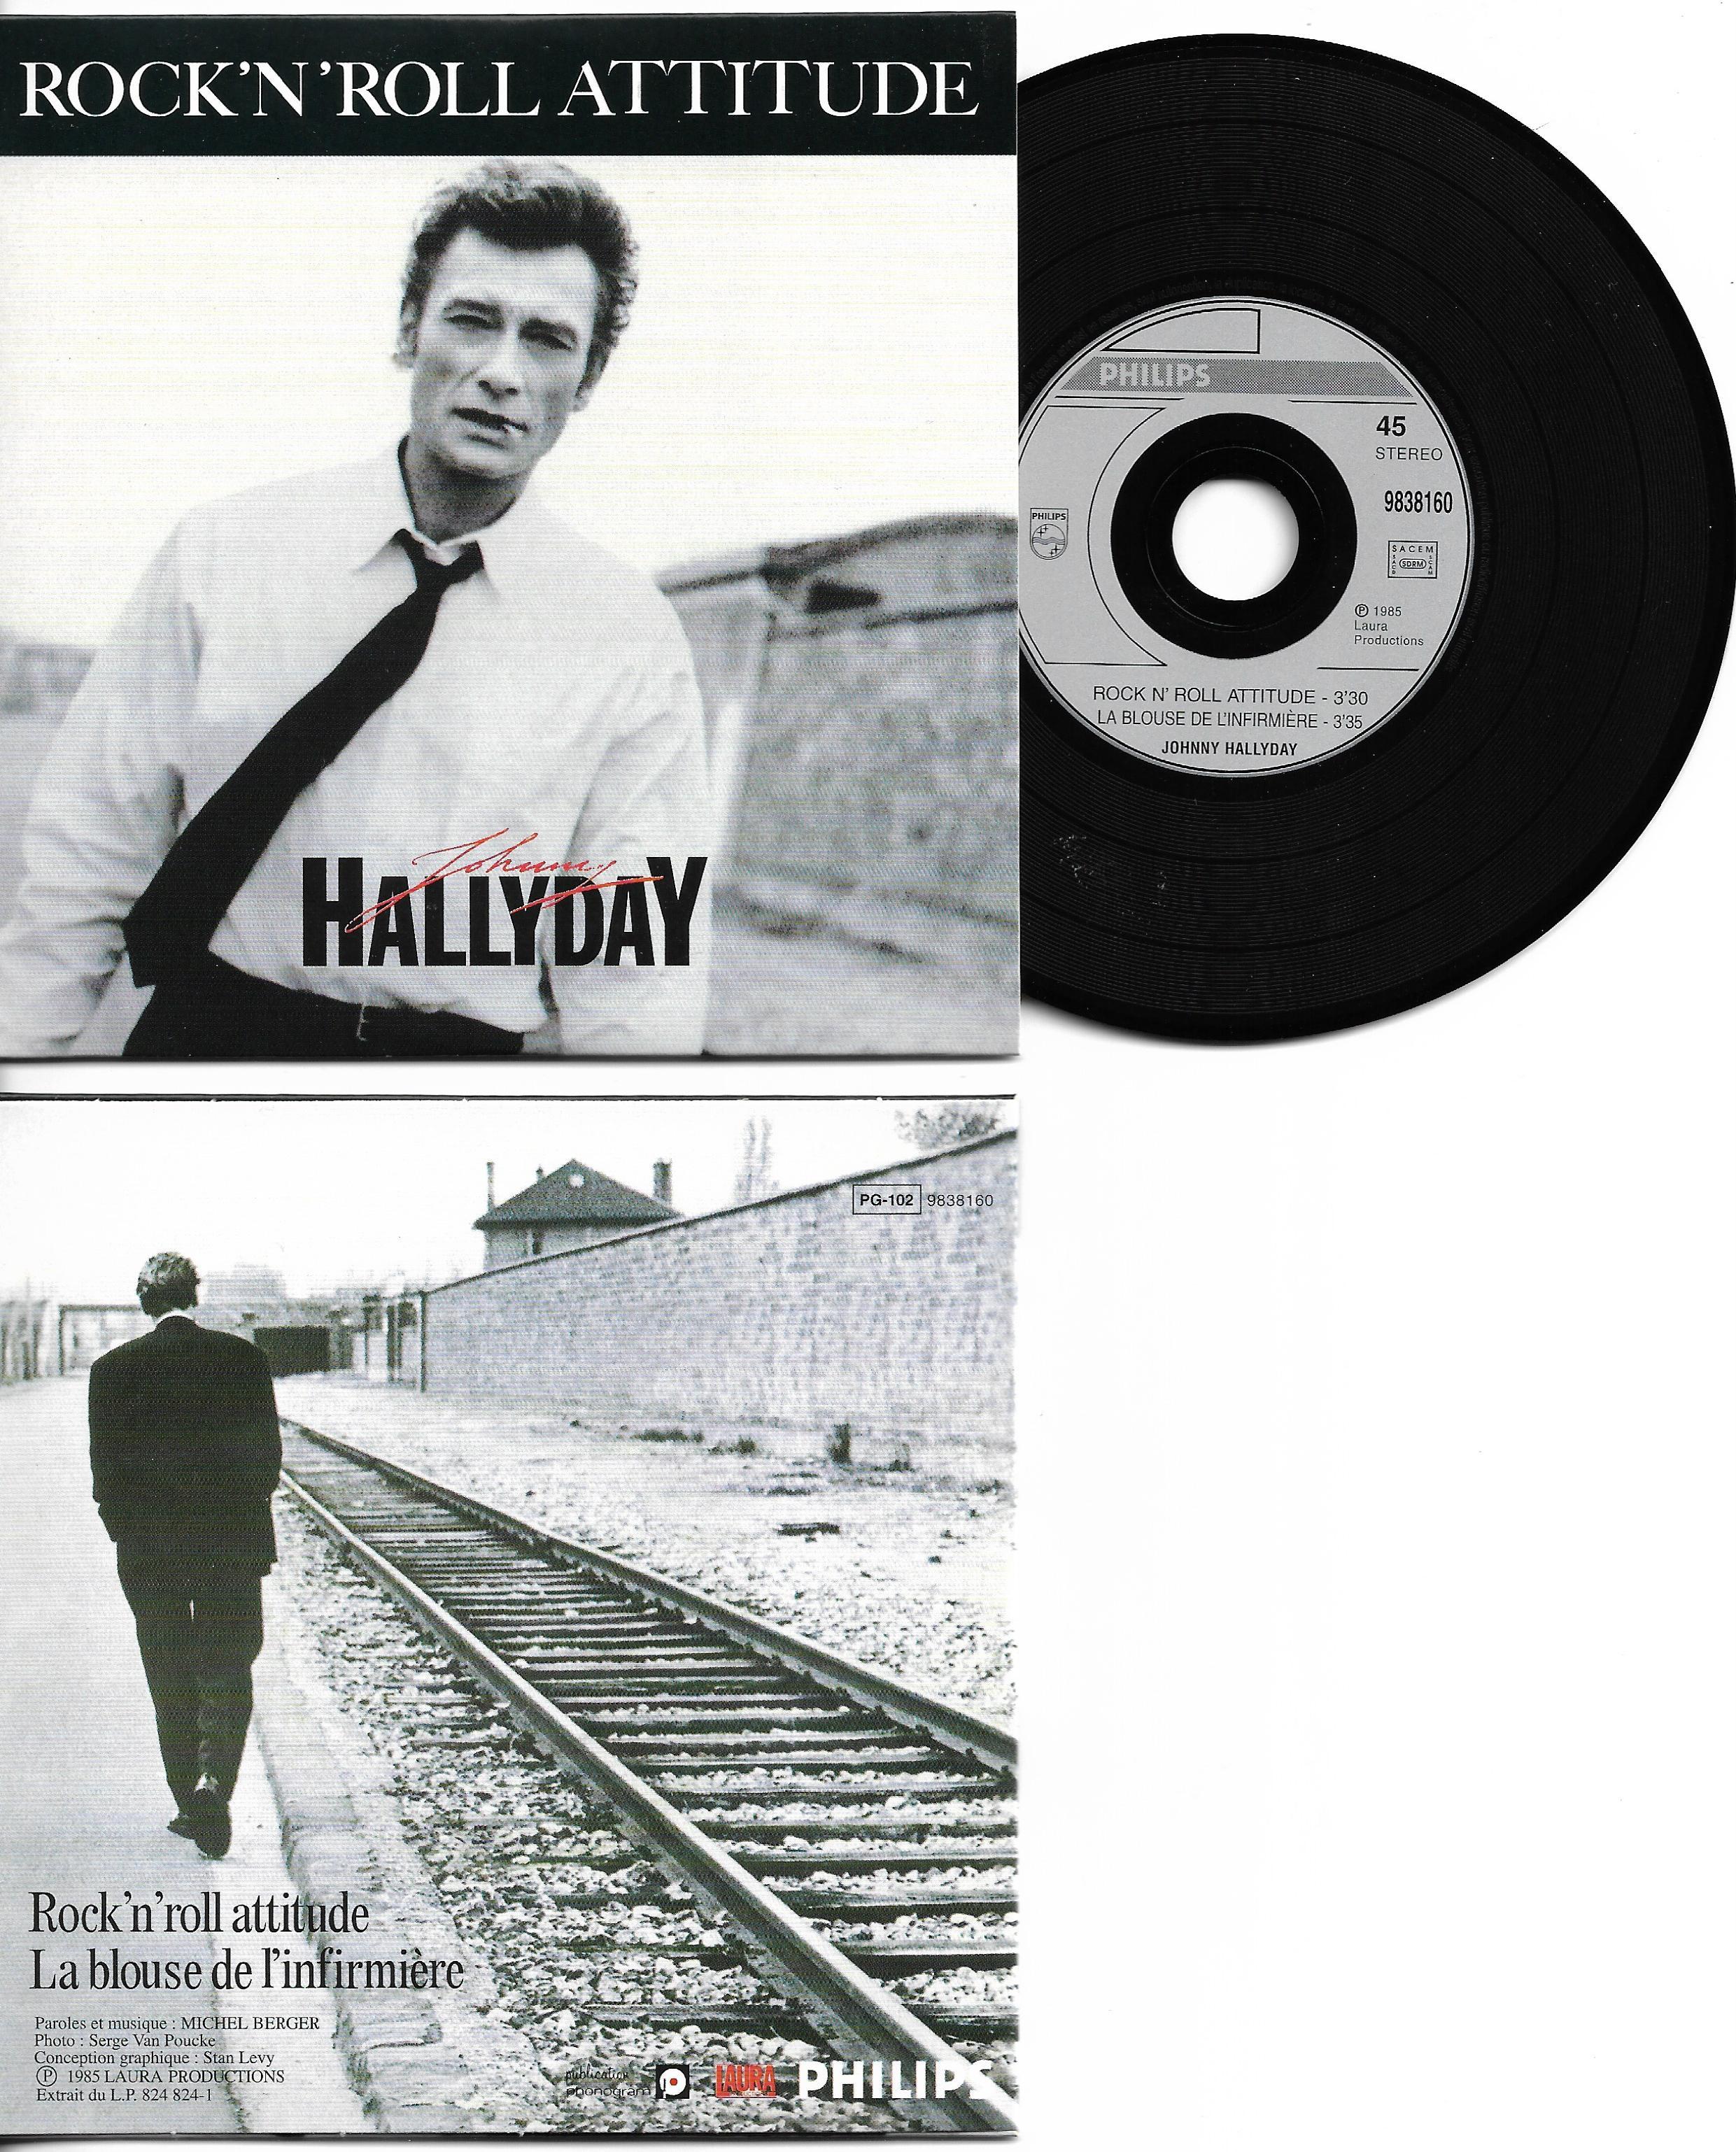 JOHNNY HALLYDAY - Rock'n'roll attitude CARD SLEEVE 2-track - CD single